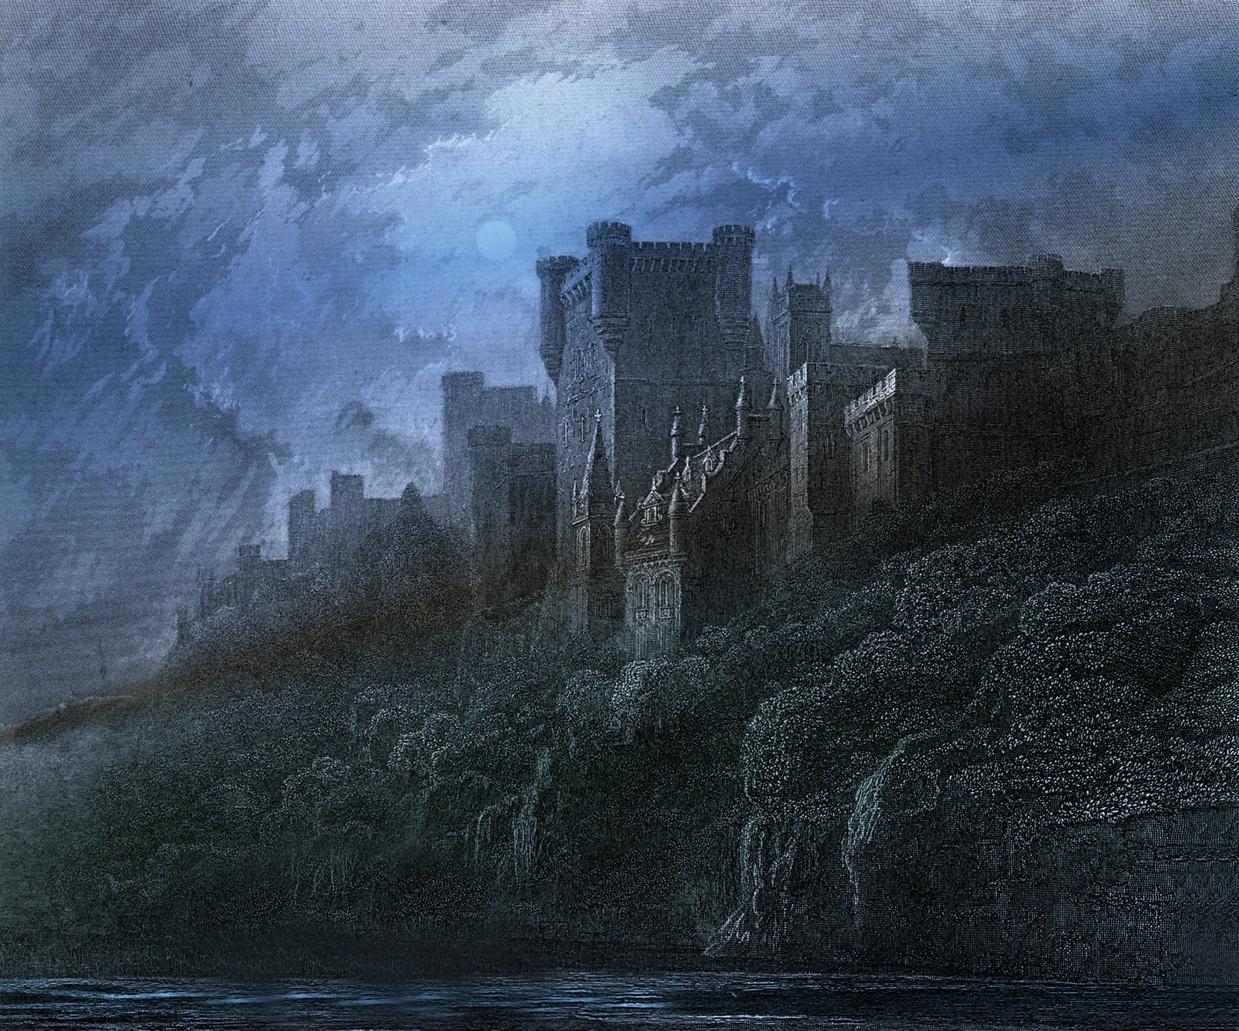 H.P. Lovecraft: L'Estraneo